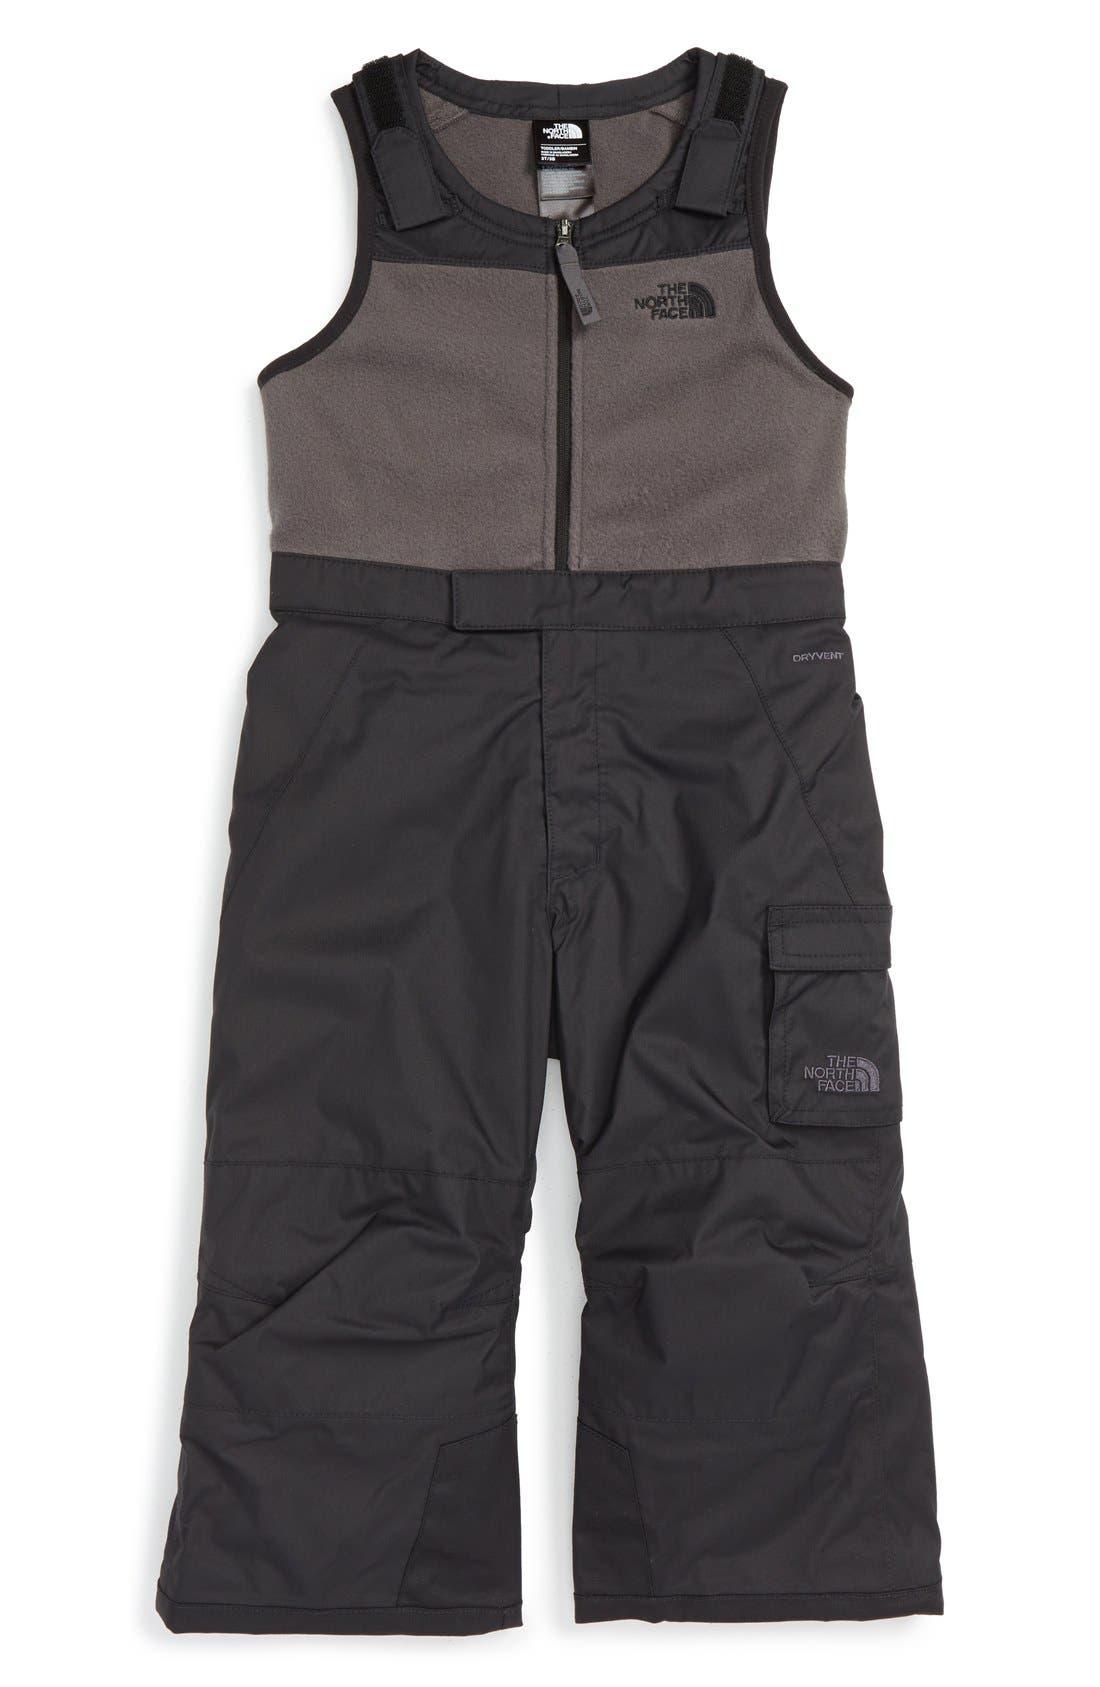 Alternate Image 1 Selected - The North Face Heekseeker™ Insulated Waterproof Bib Snowsuit (Toddler Boys & Little Boys)